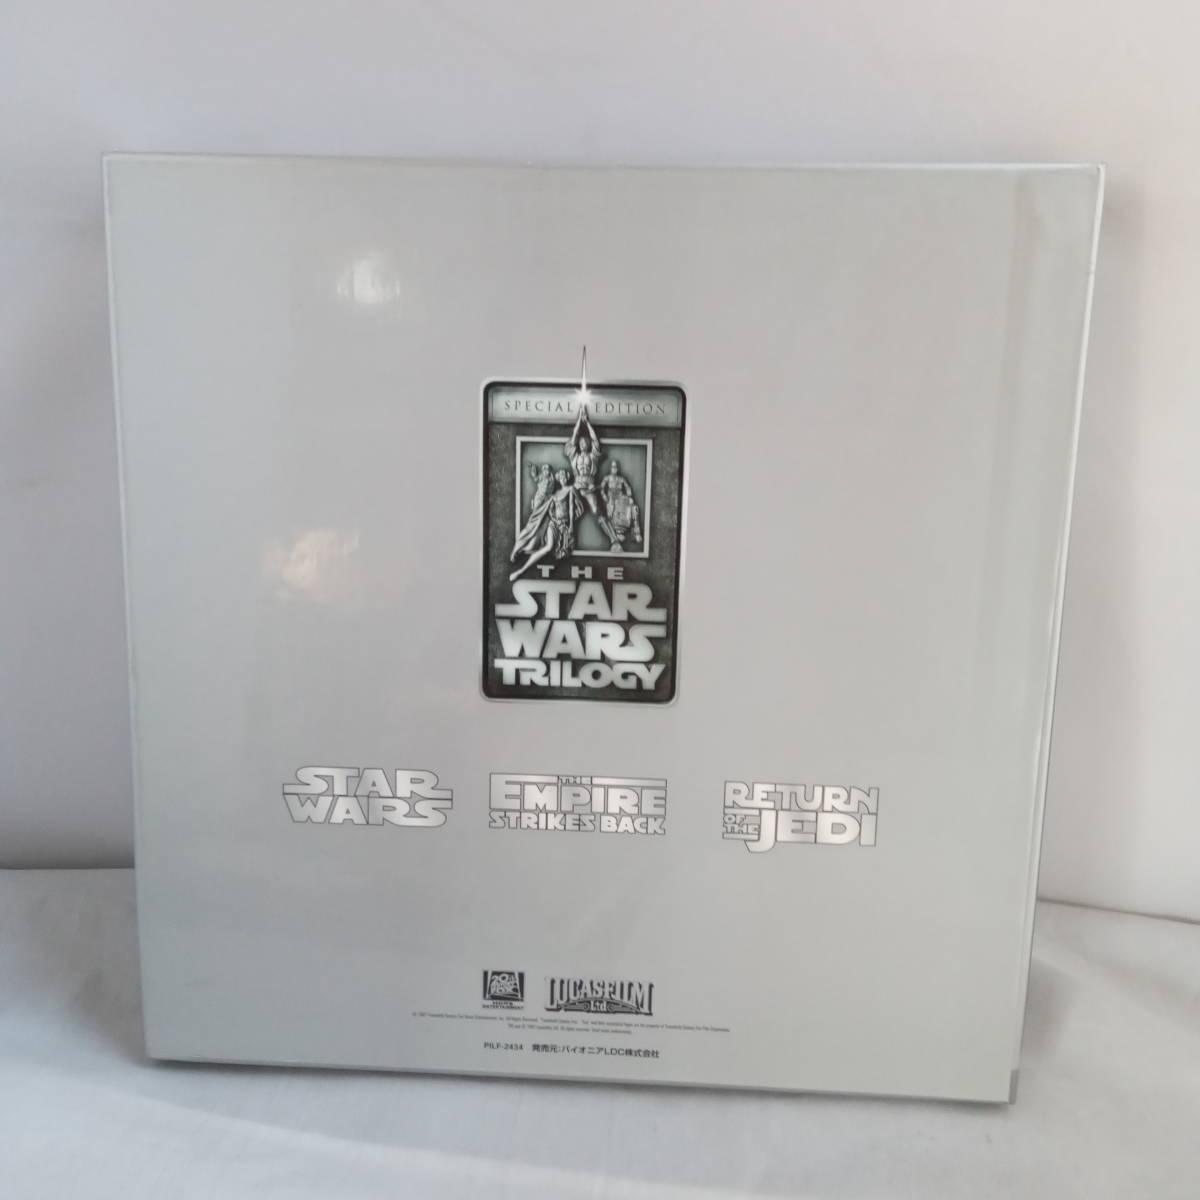 L2721 LD・レーザーディスク STAR WARS TRILOGY SPECIAL EDITION レーザーディスク スターウォーズ トリロジー_画像2